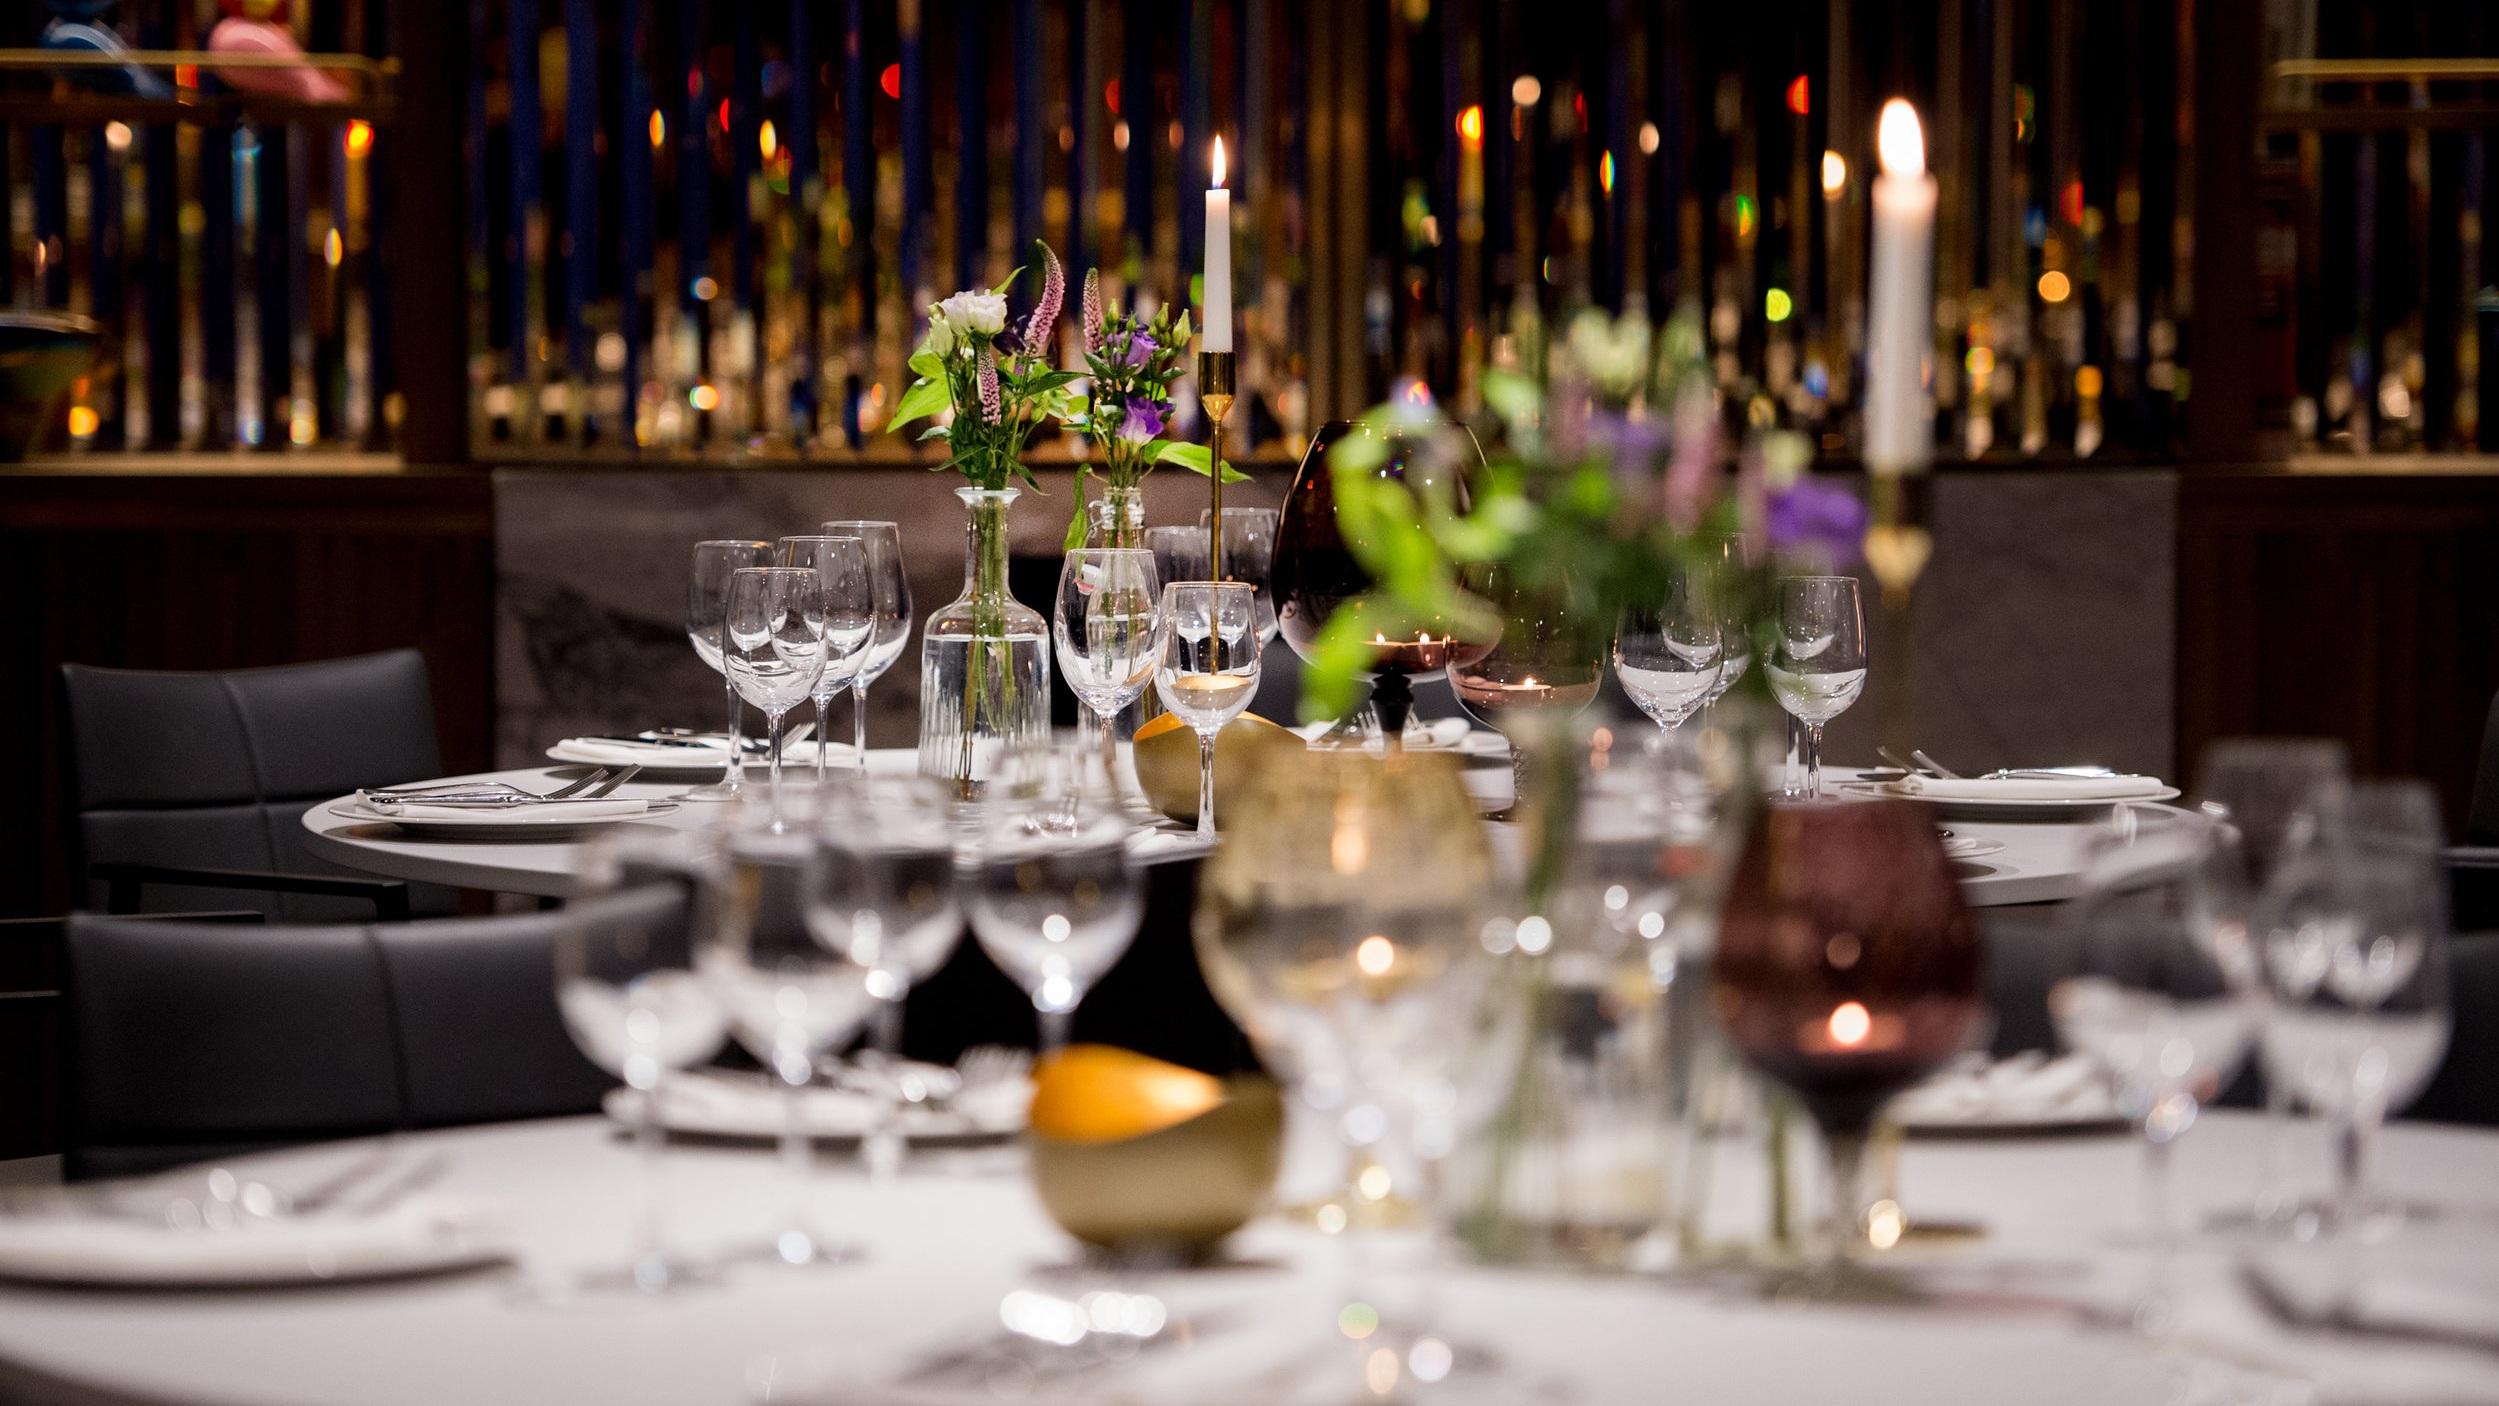 Marylebone+Room_Blue+Room_+Cabaret+style+dining_table+details_300+dpi+6.jpg